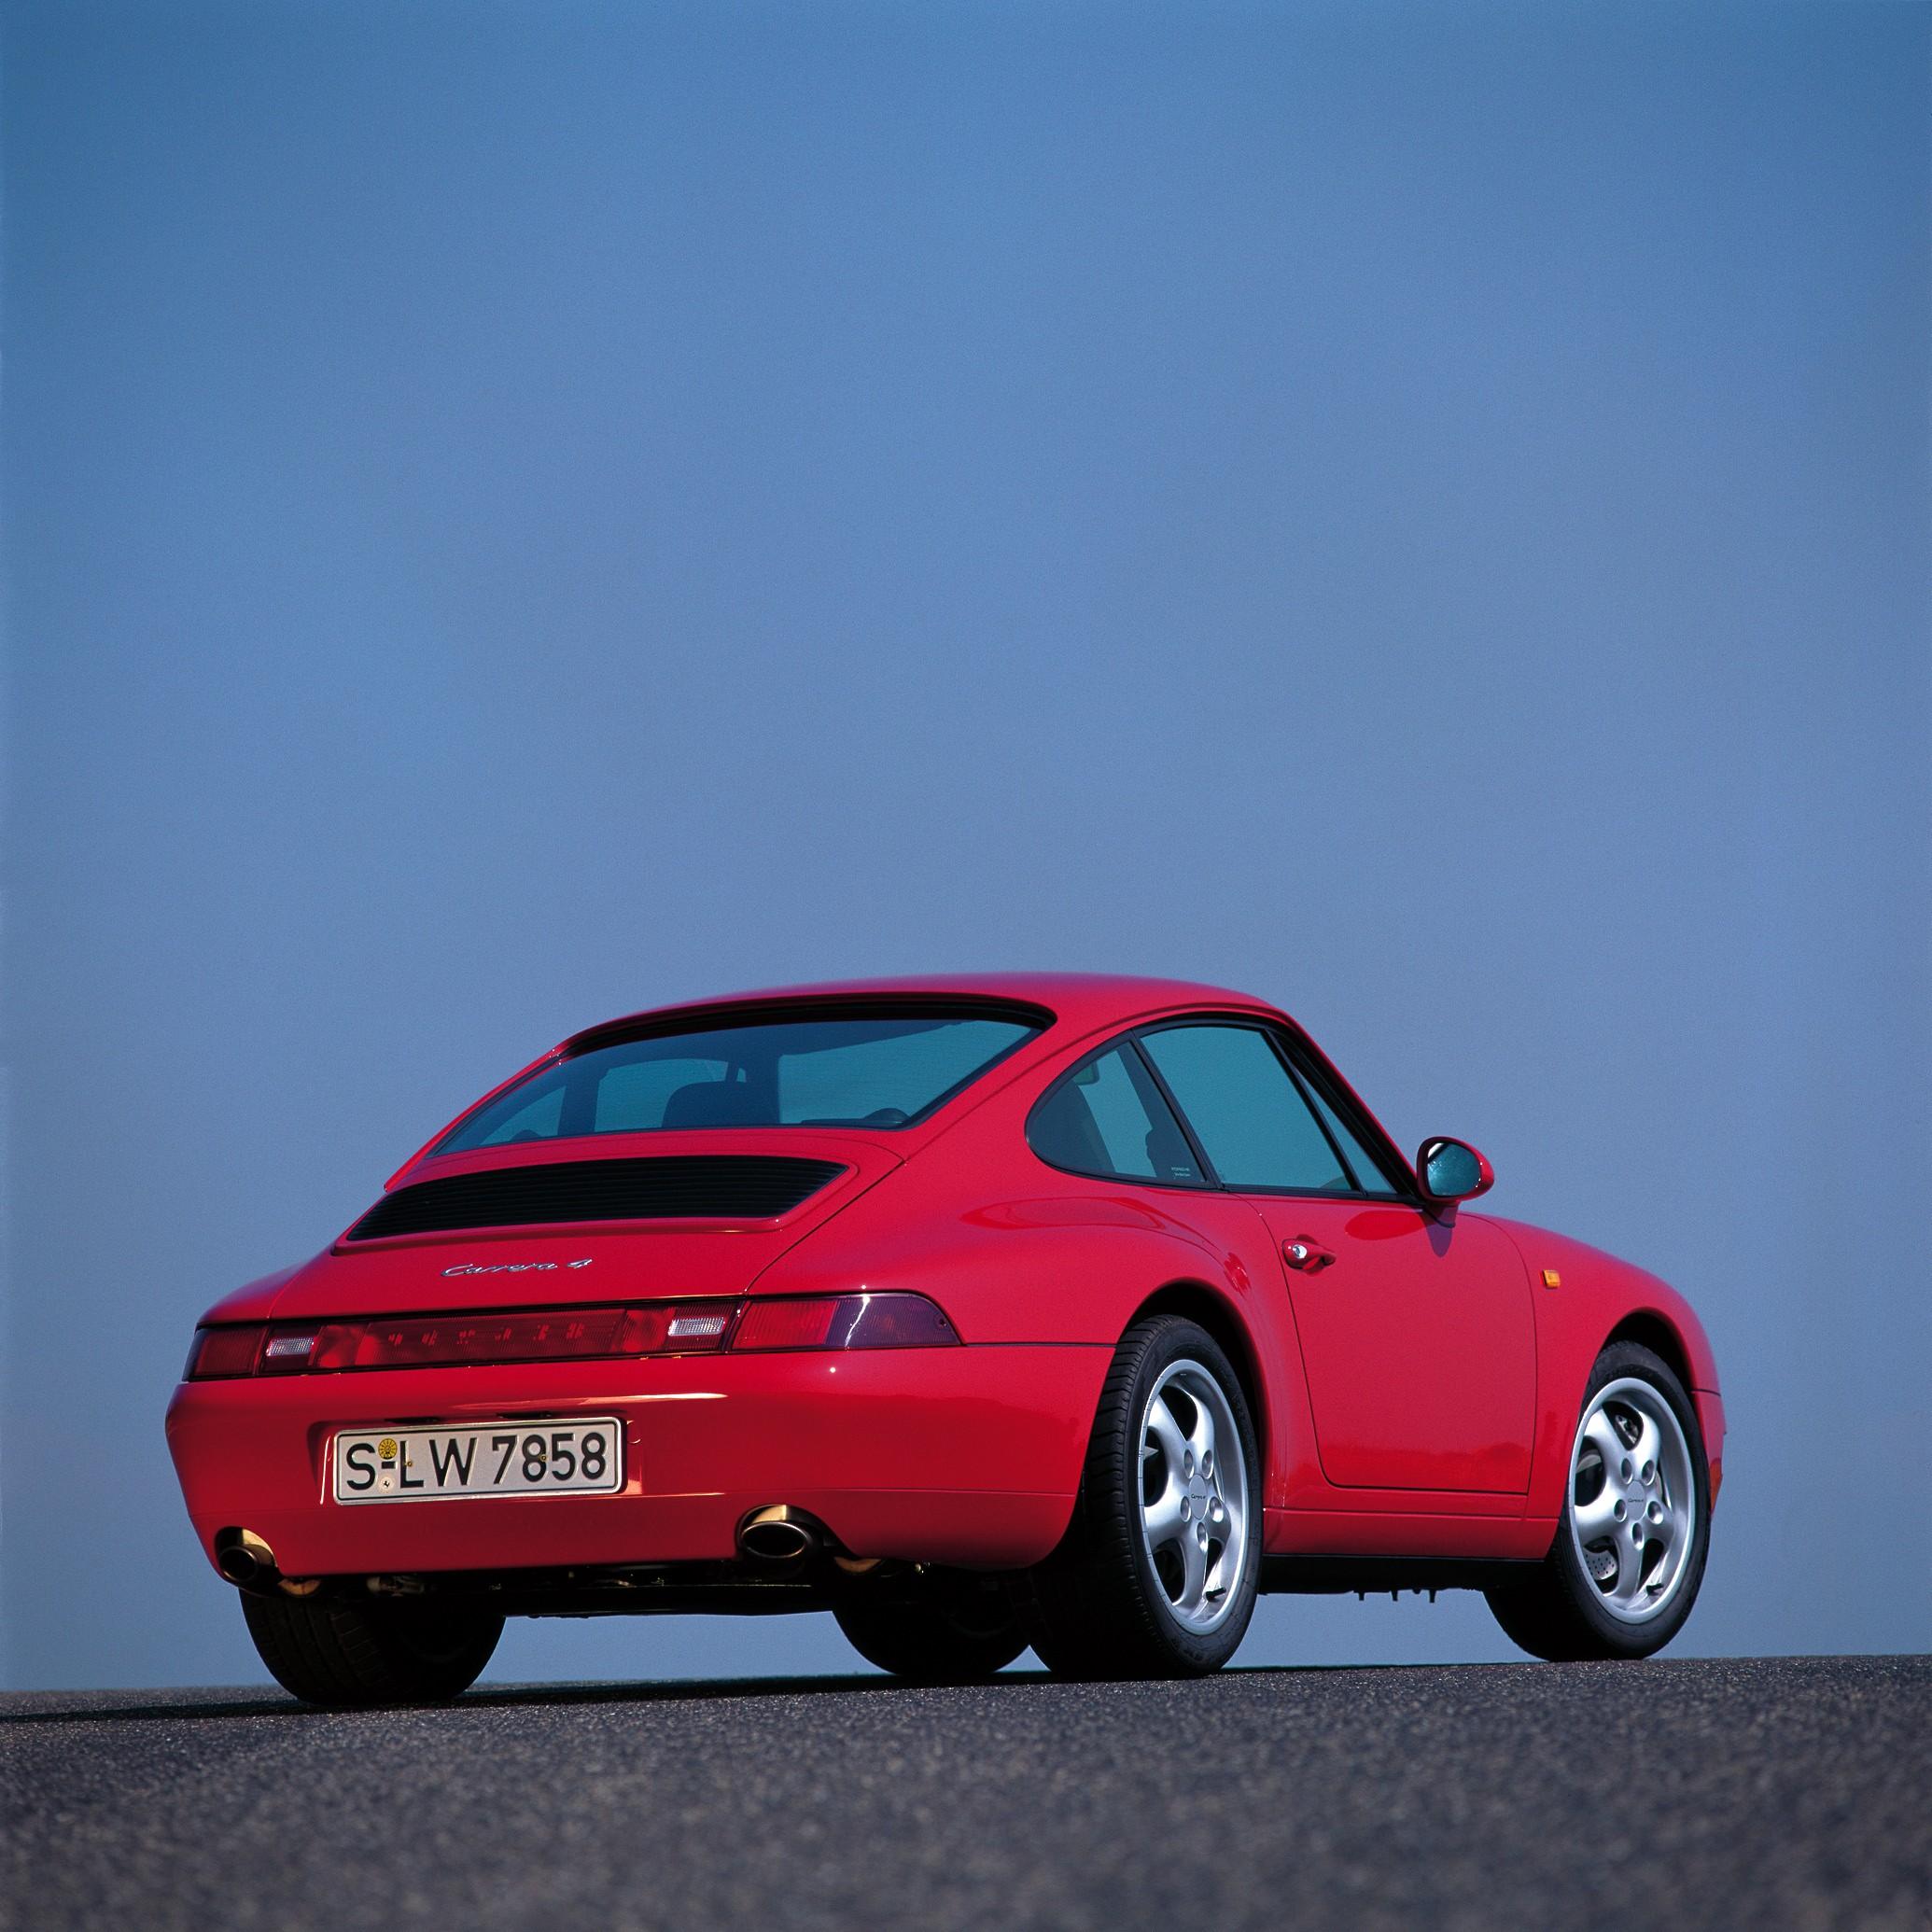 1997 Porsche 911 Camshaft: PORSCHE 911 Carrera 4 (993) Specs & Photos